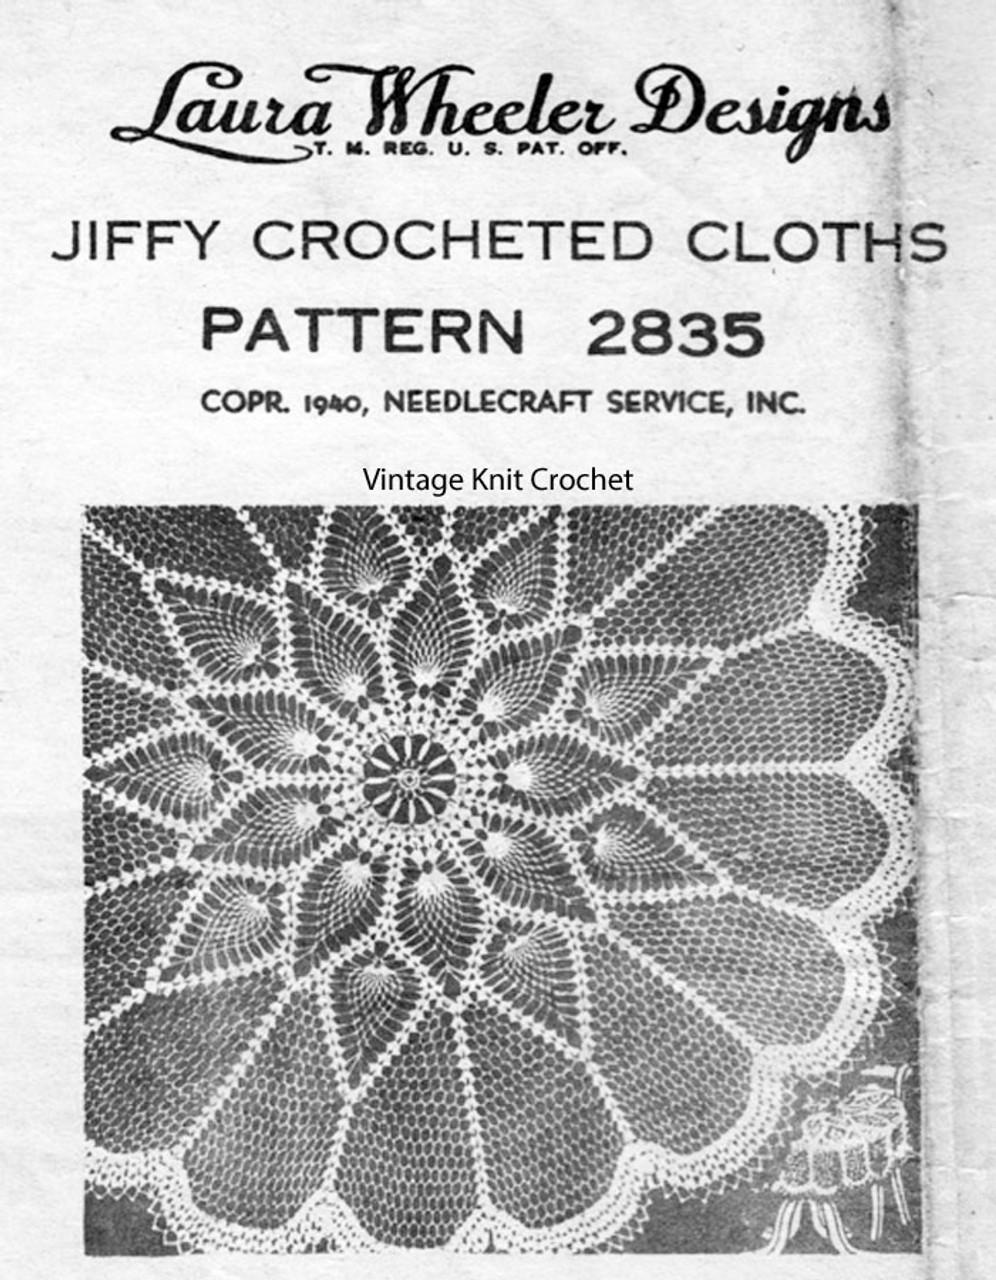 Round Pineapple Tablecloth Crochet Pattern Design 2835